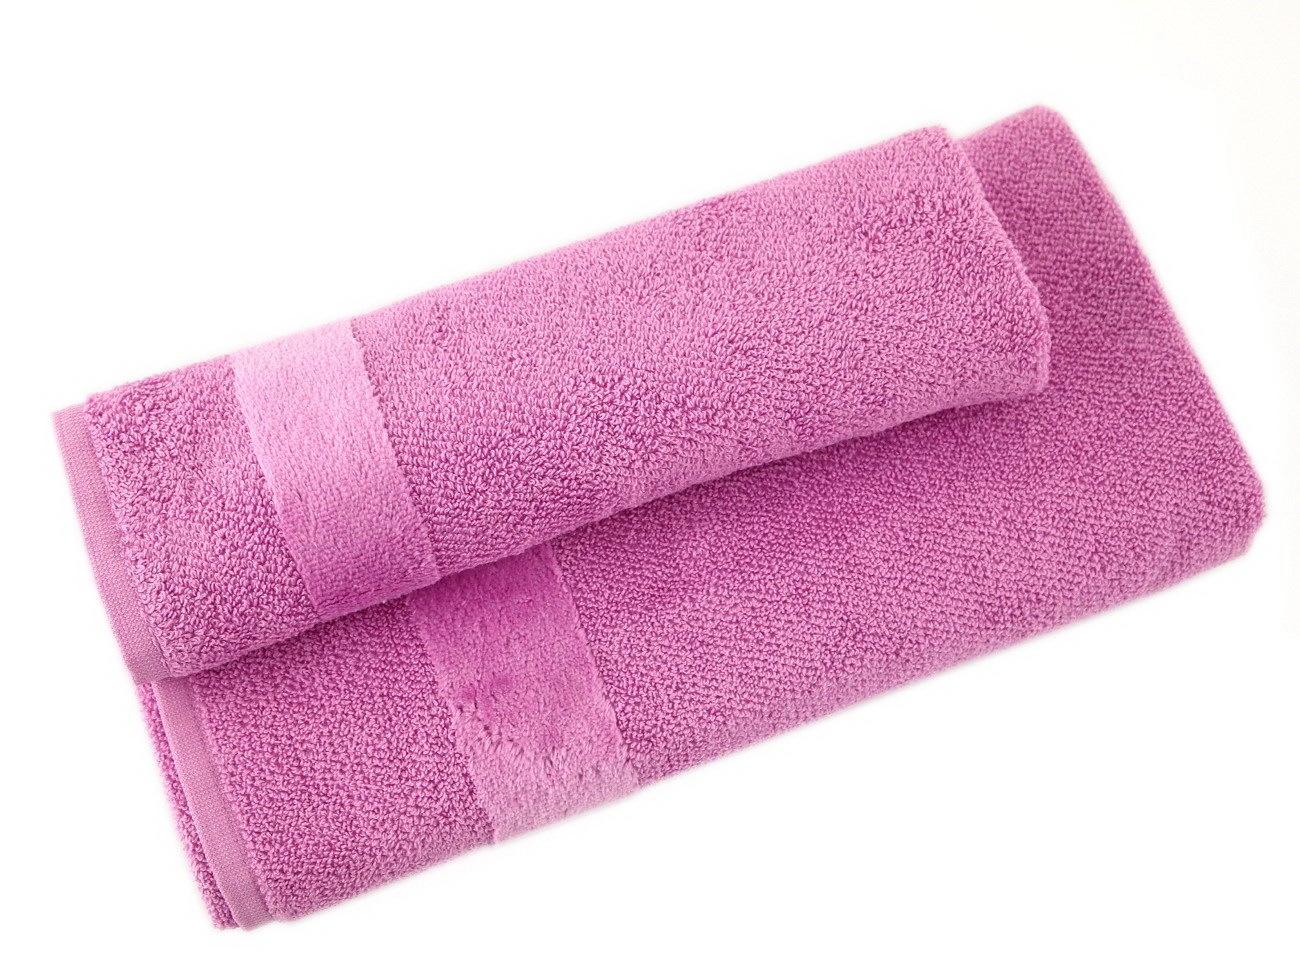 Наборы полотенец Набор полотенец 3 шт Carrara Fyber розовый elitnye-polotentsa-mahrovye-fyber-633-rozovye-ot-carrara-italiya.JPG